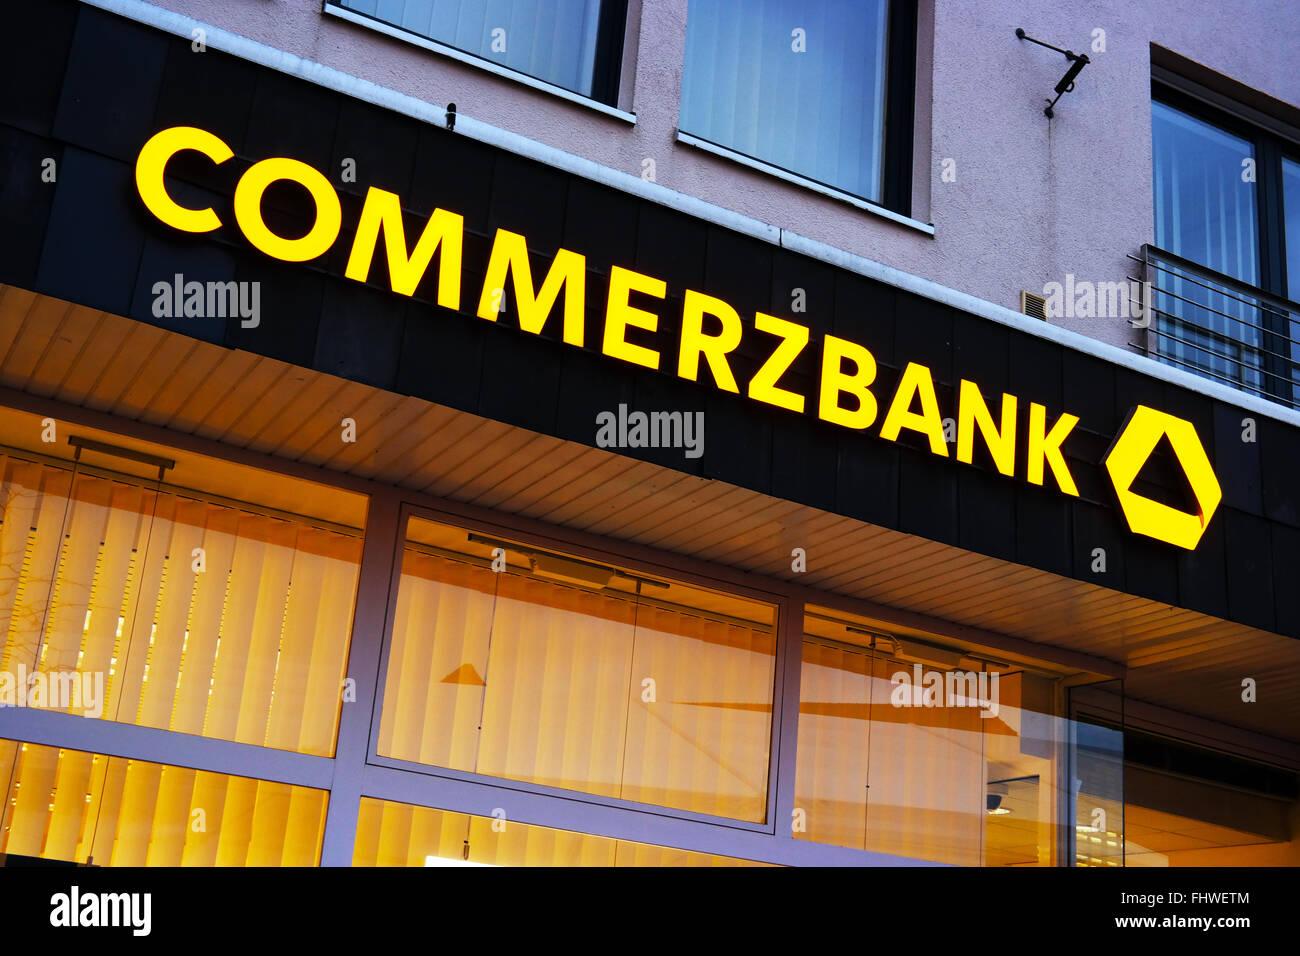 Commerzbank logo - Stock Image